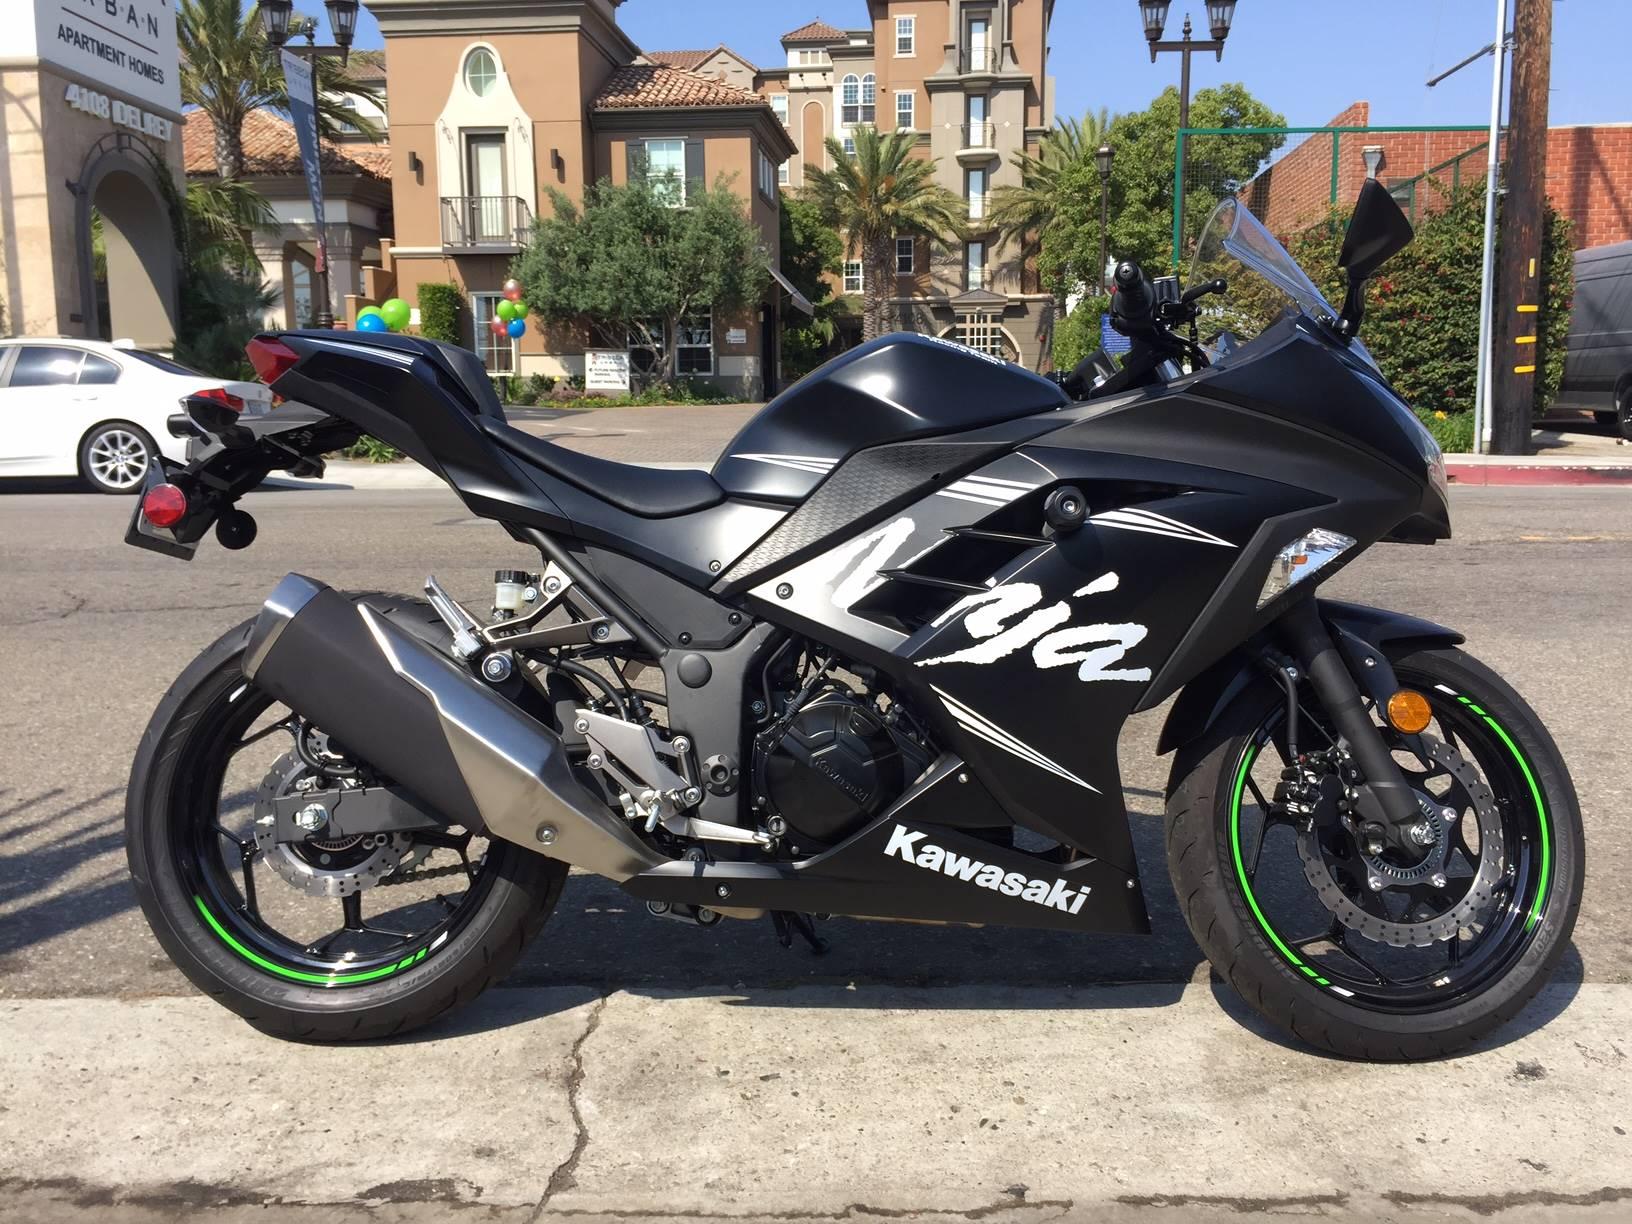 2017 Kawasaki Ninja 300 ABS Winter Test Edition for sale 5799